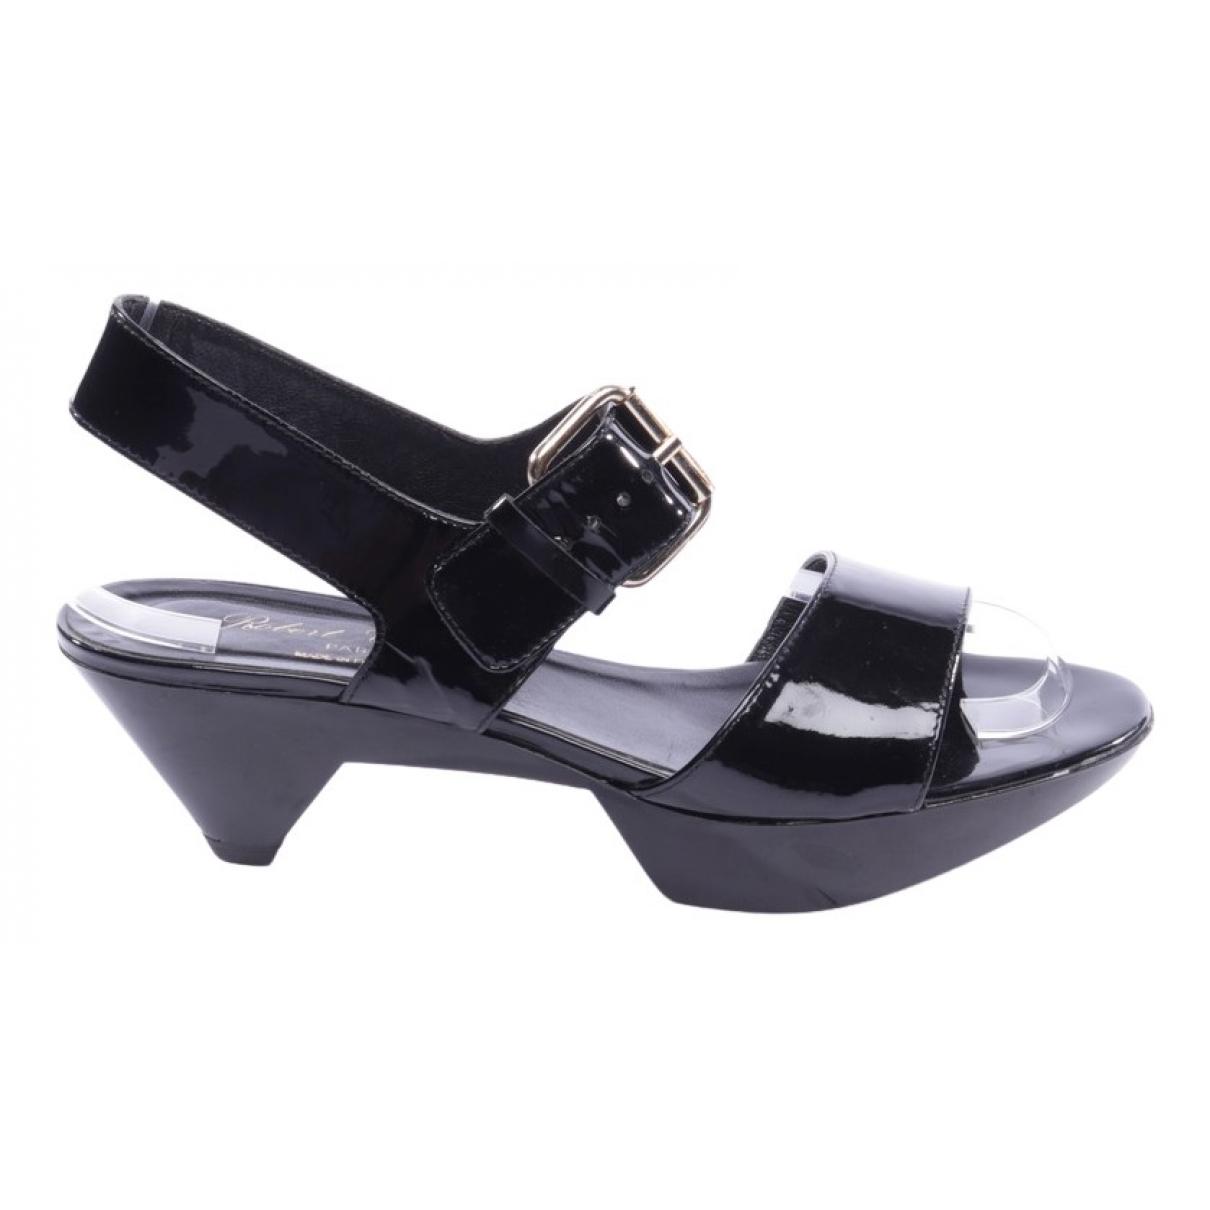 Robert Clergerie N Black Leather Sandals for Women 36.5 EU